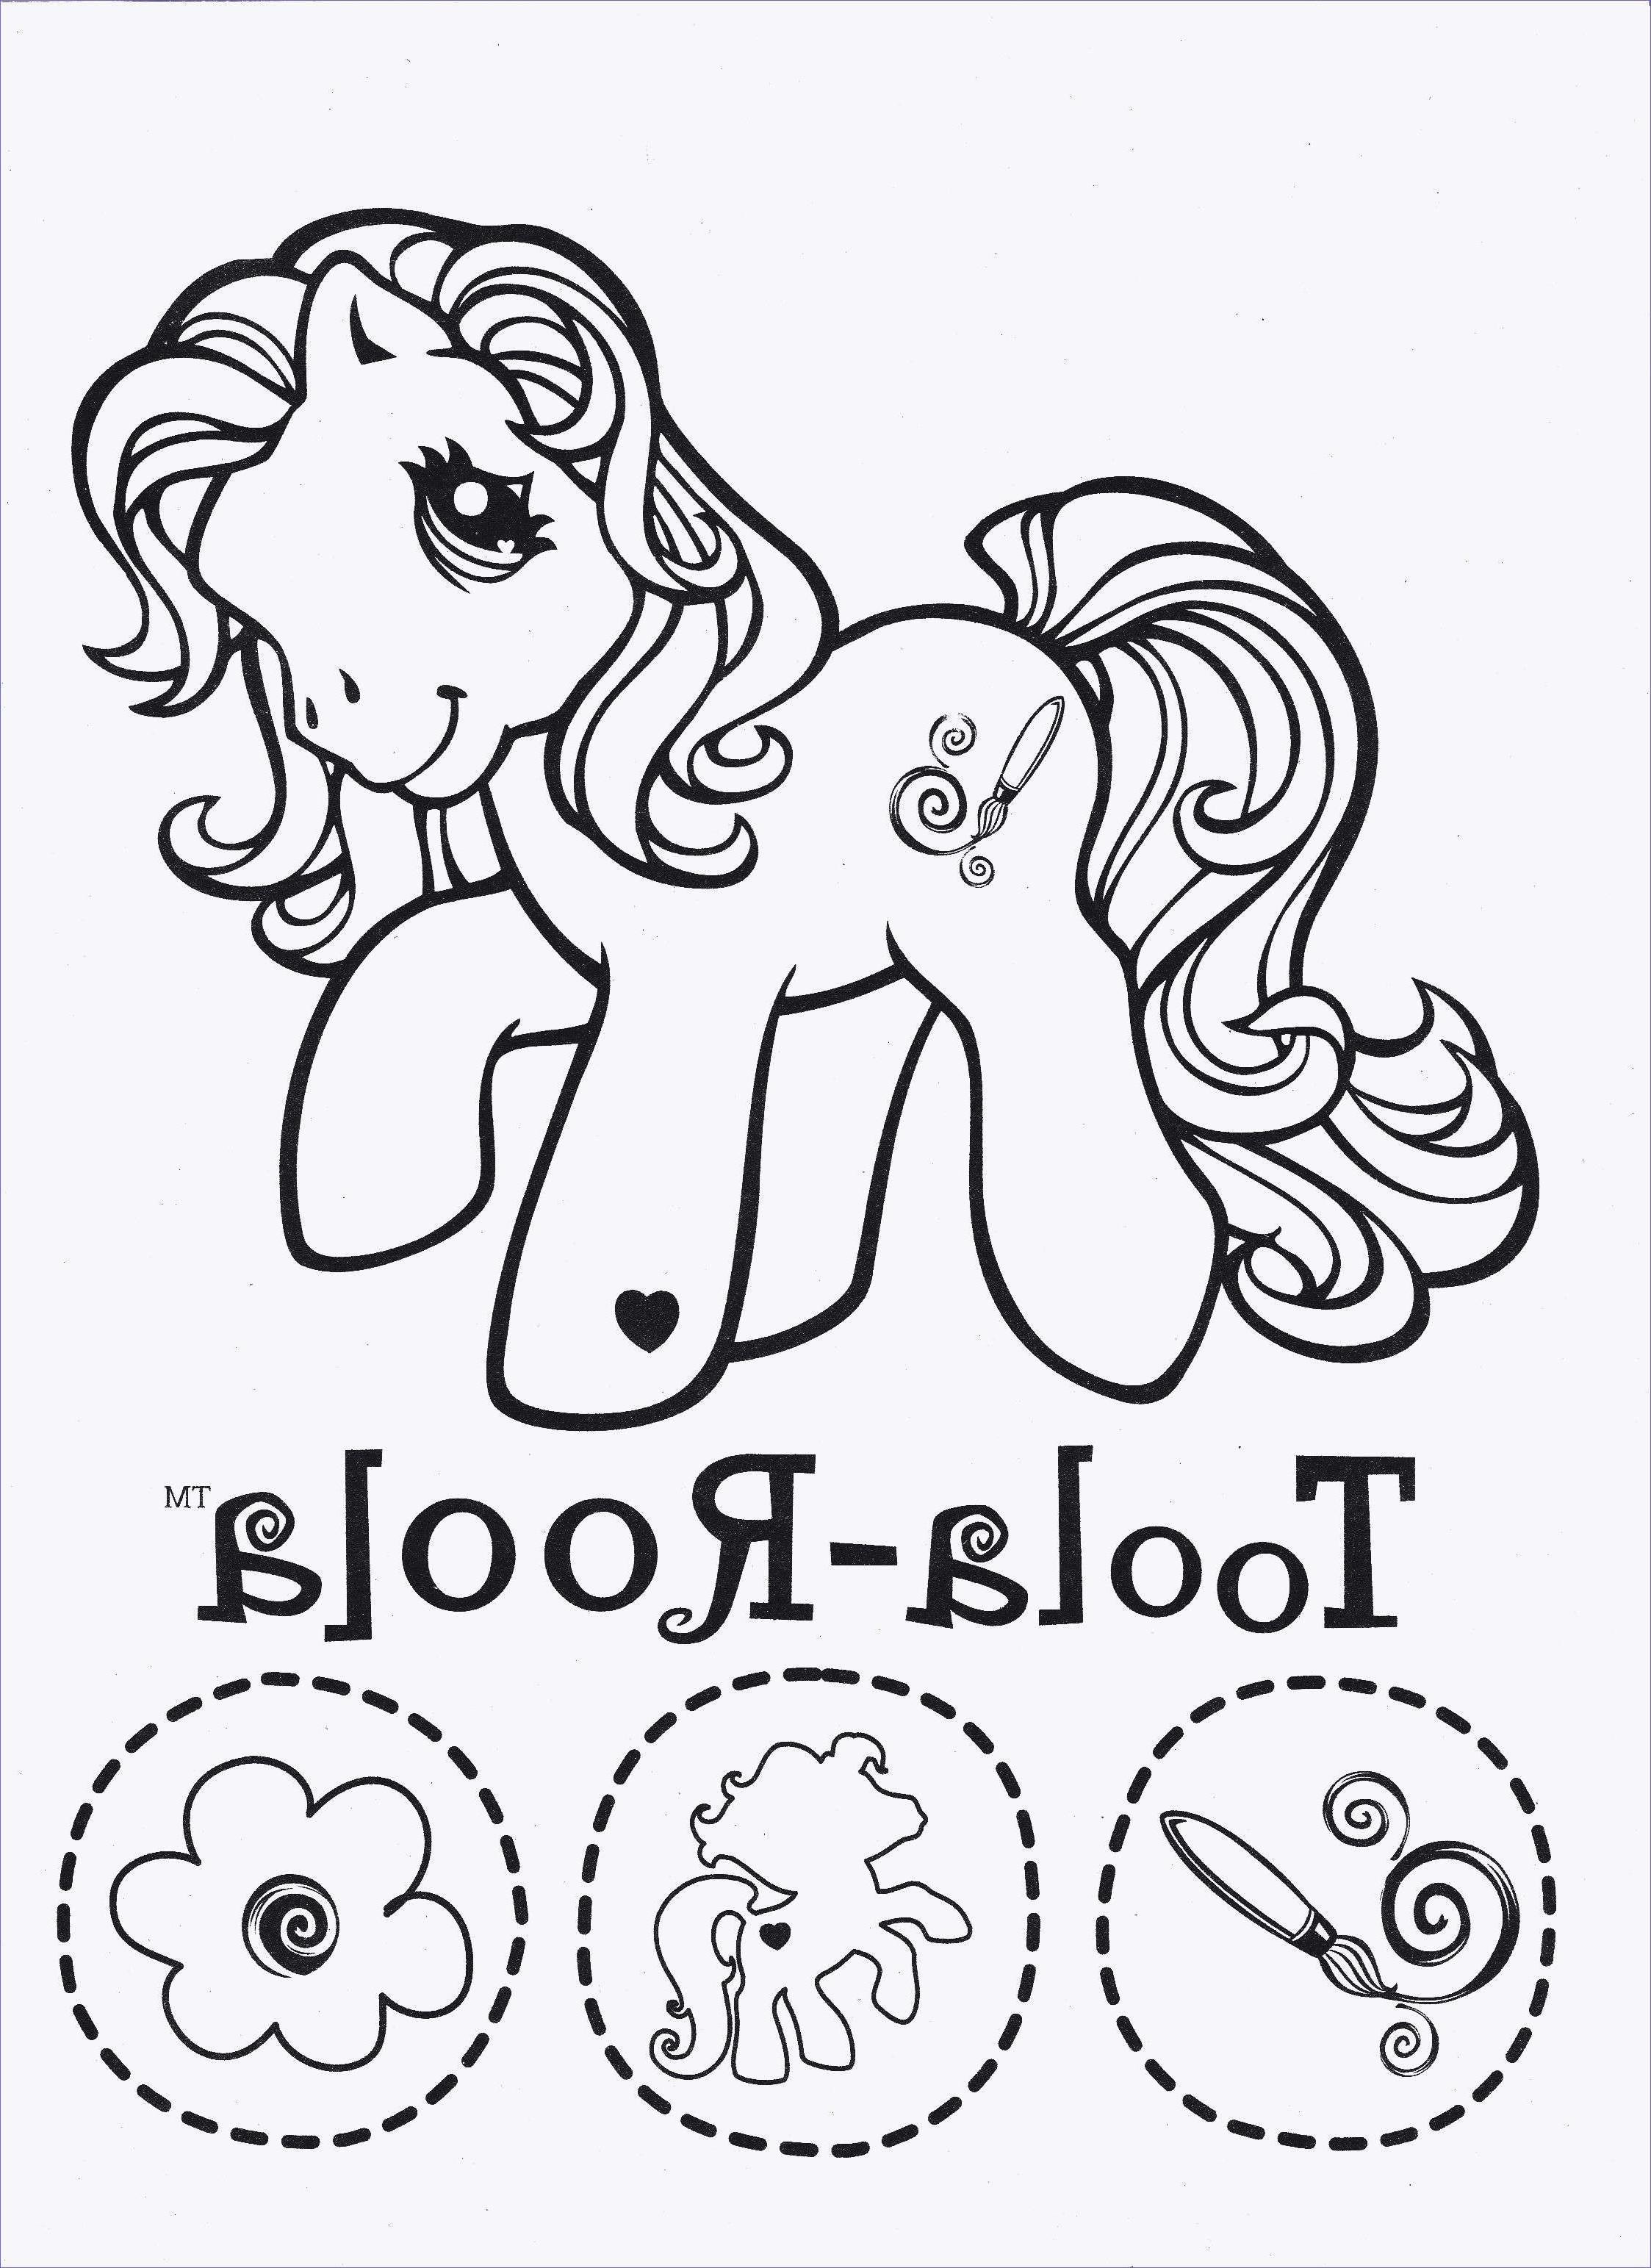 My Little Pony Friendship is Magic Ausmalbilder Frisch 32 Fantastisch Ausmalbilder My Little Pony – Malvorlagen Ideen Bild